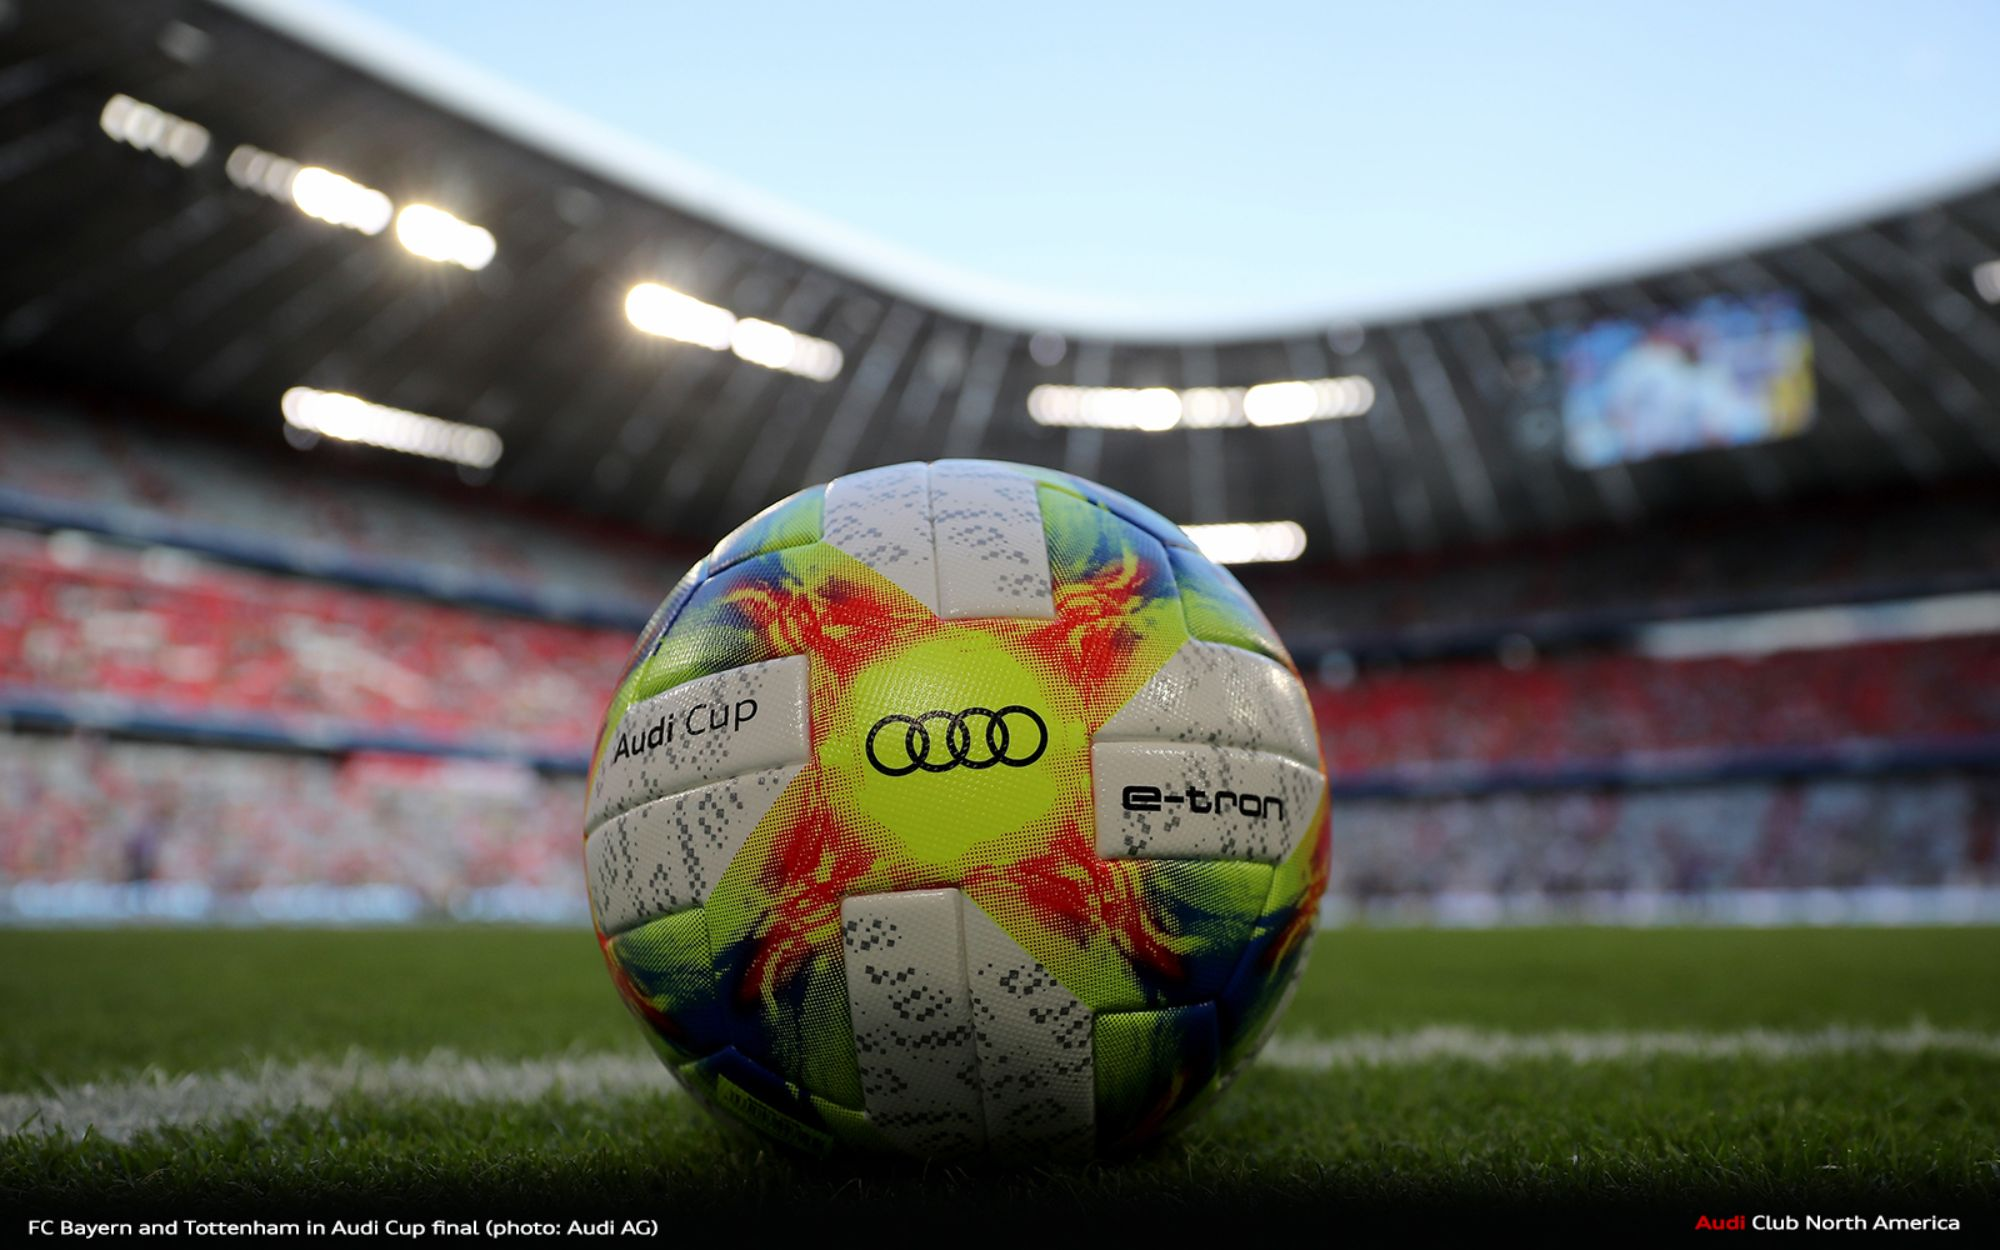 FC Bayern and Tottenham in Audi Cup Final